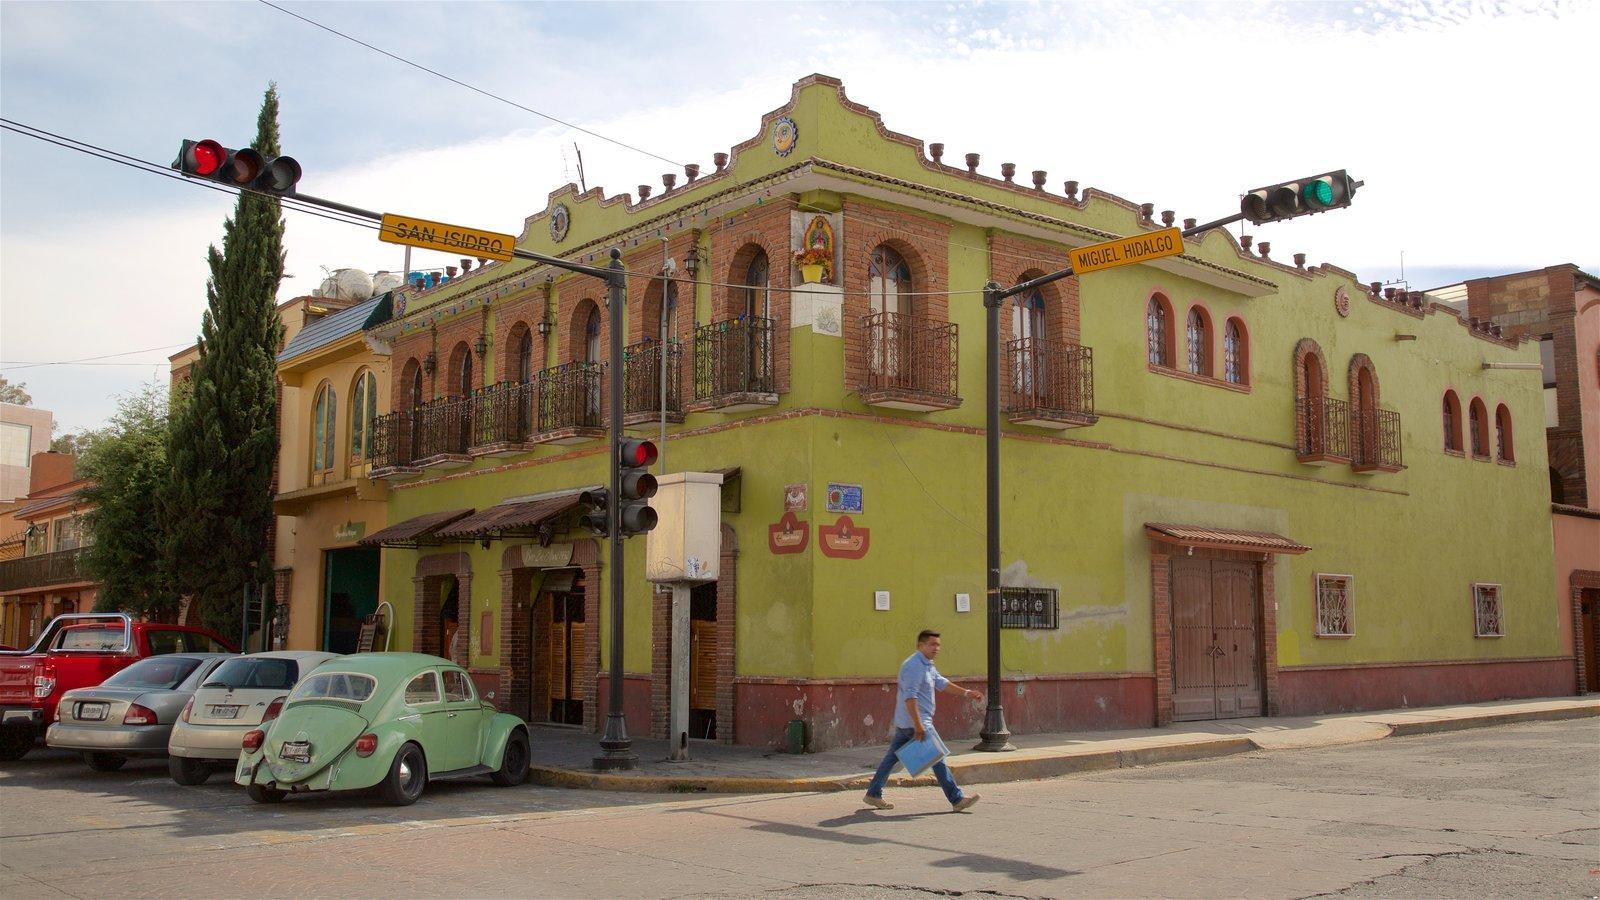 Landscape Pictures: View Images of Toluca  Metepec Mexico